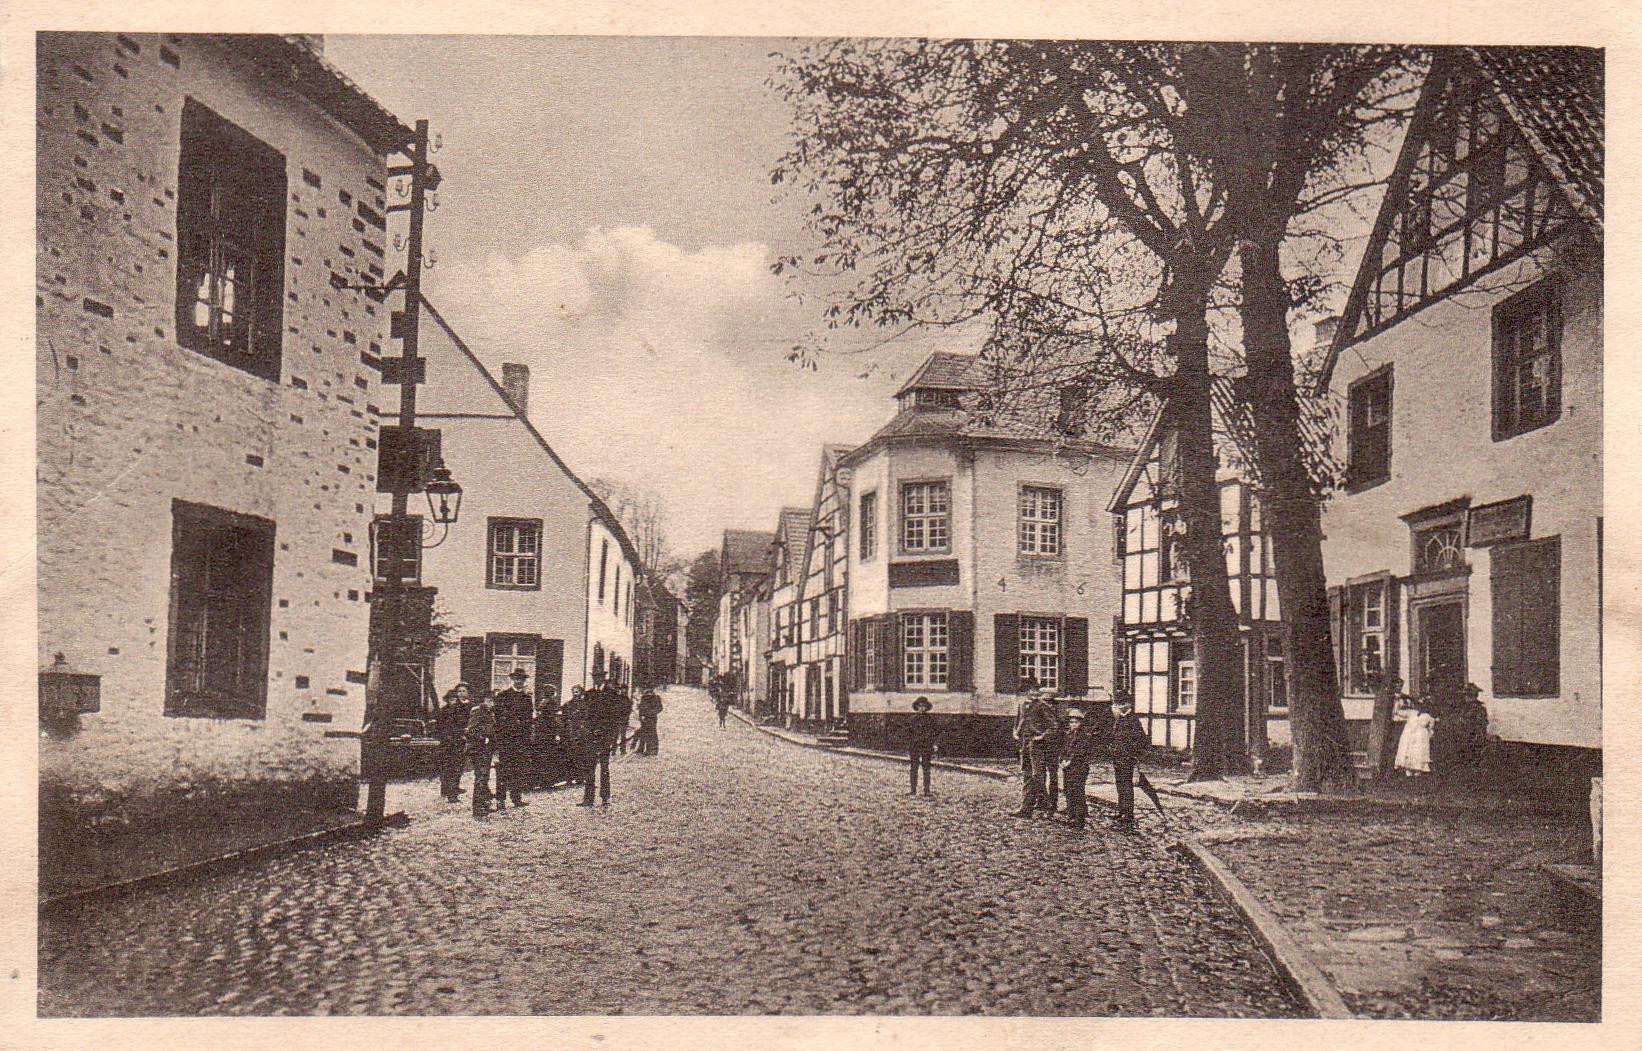 Markt-Rathaus-Reib-his